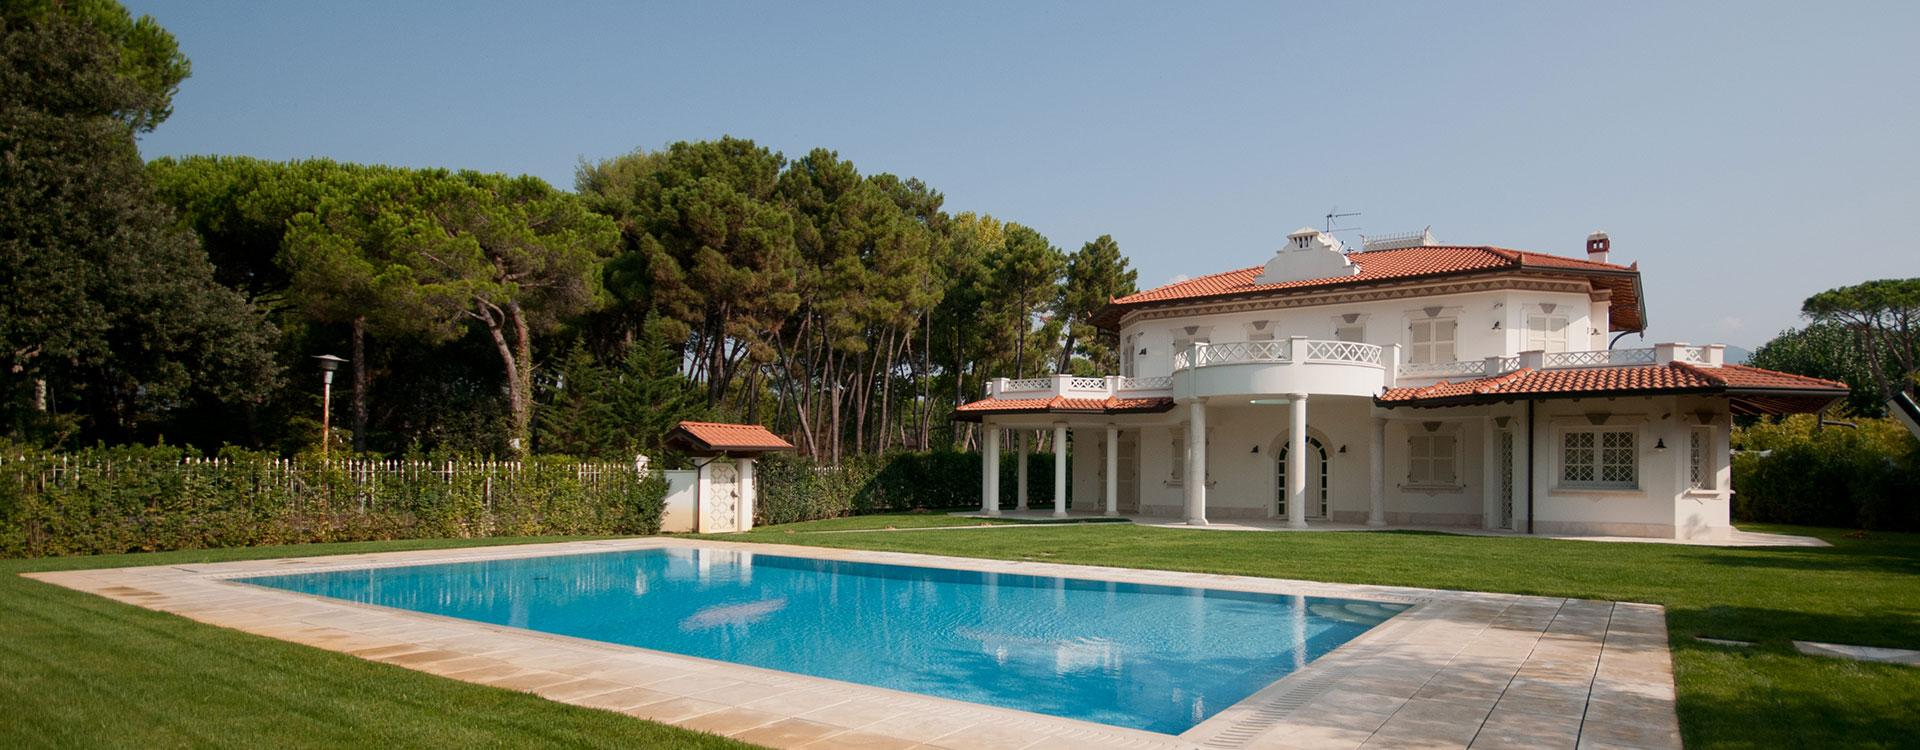 Villa con piscina vicino al mare